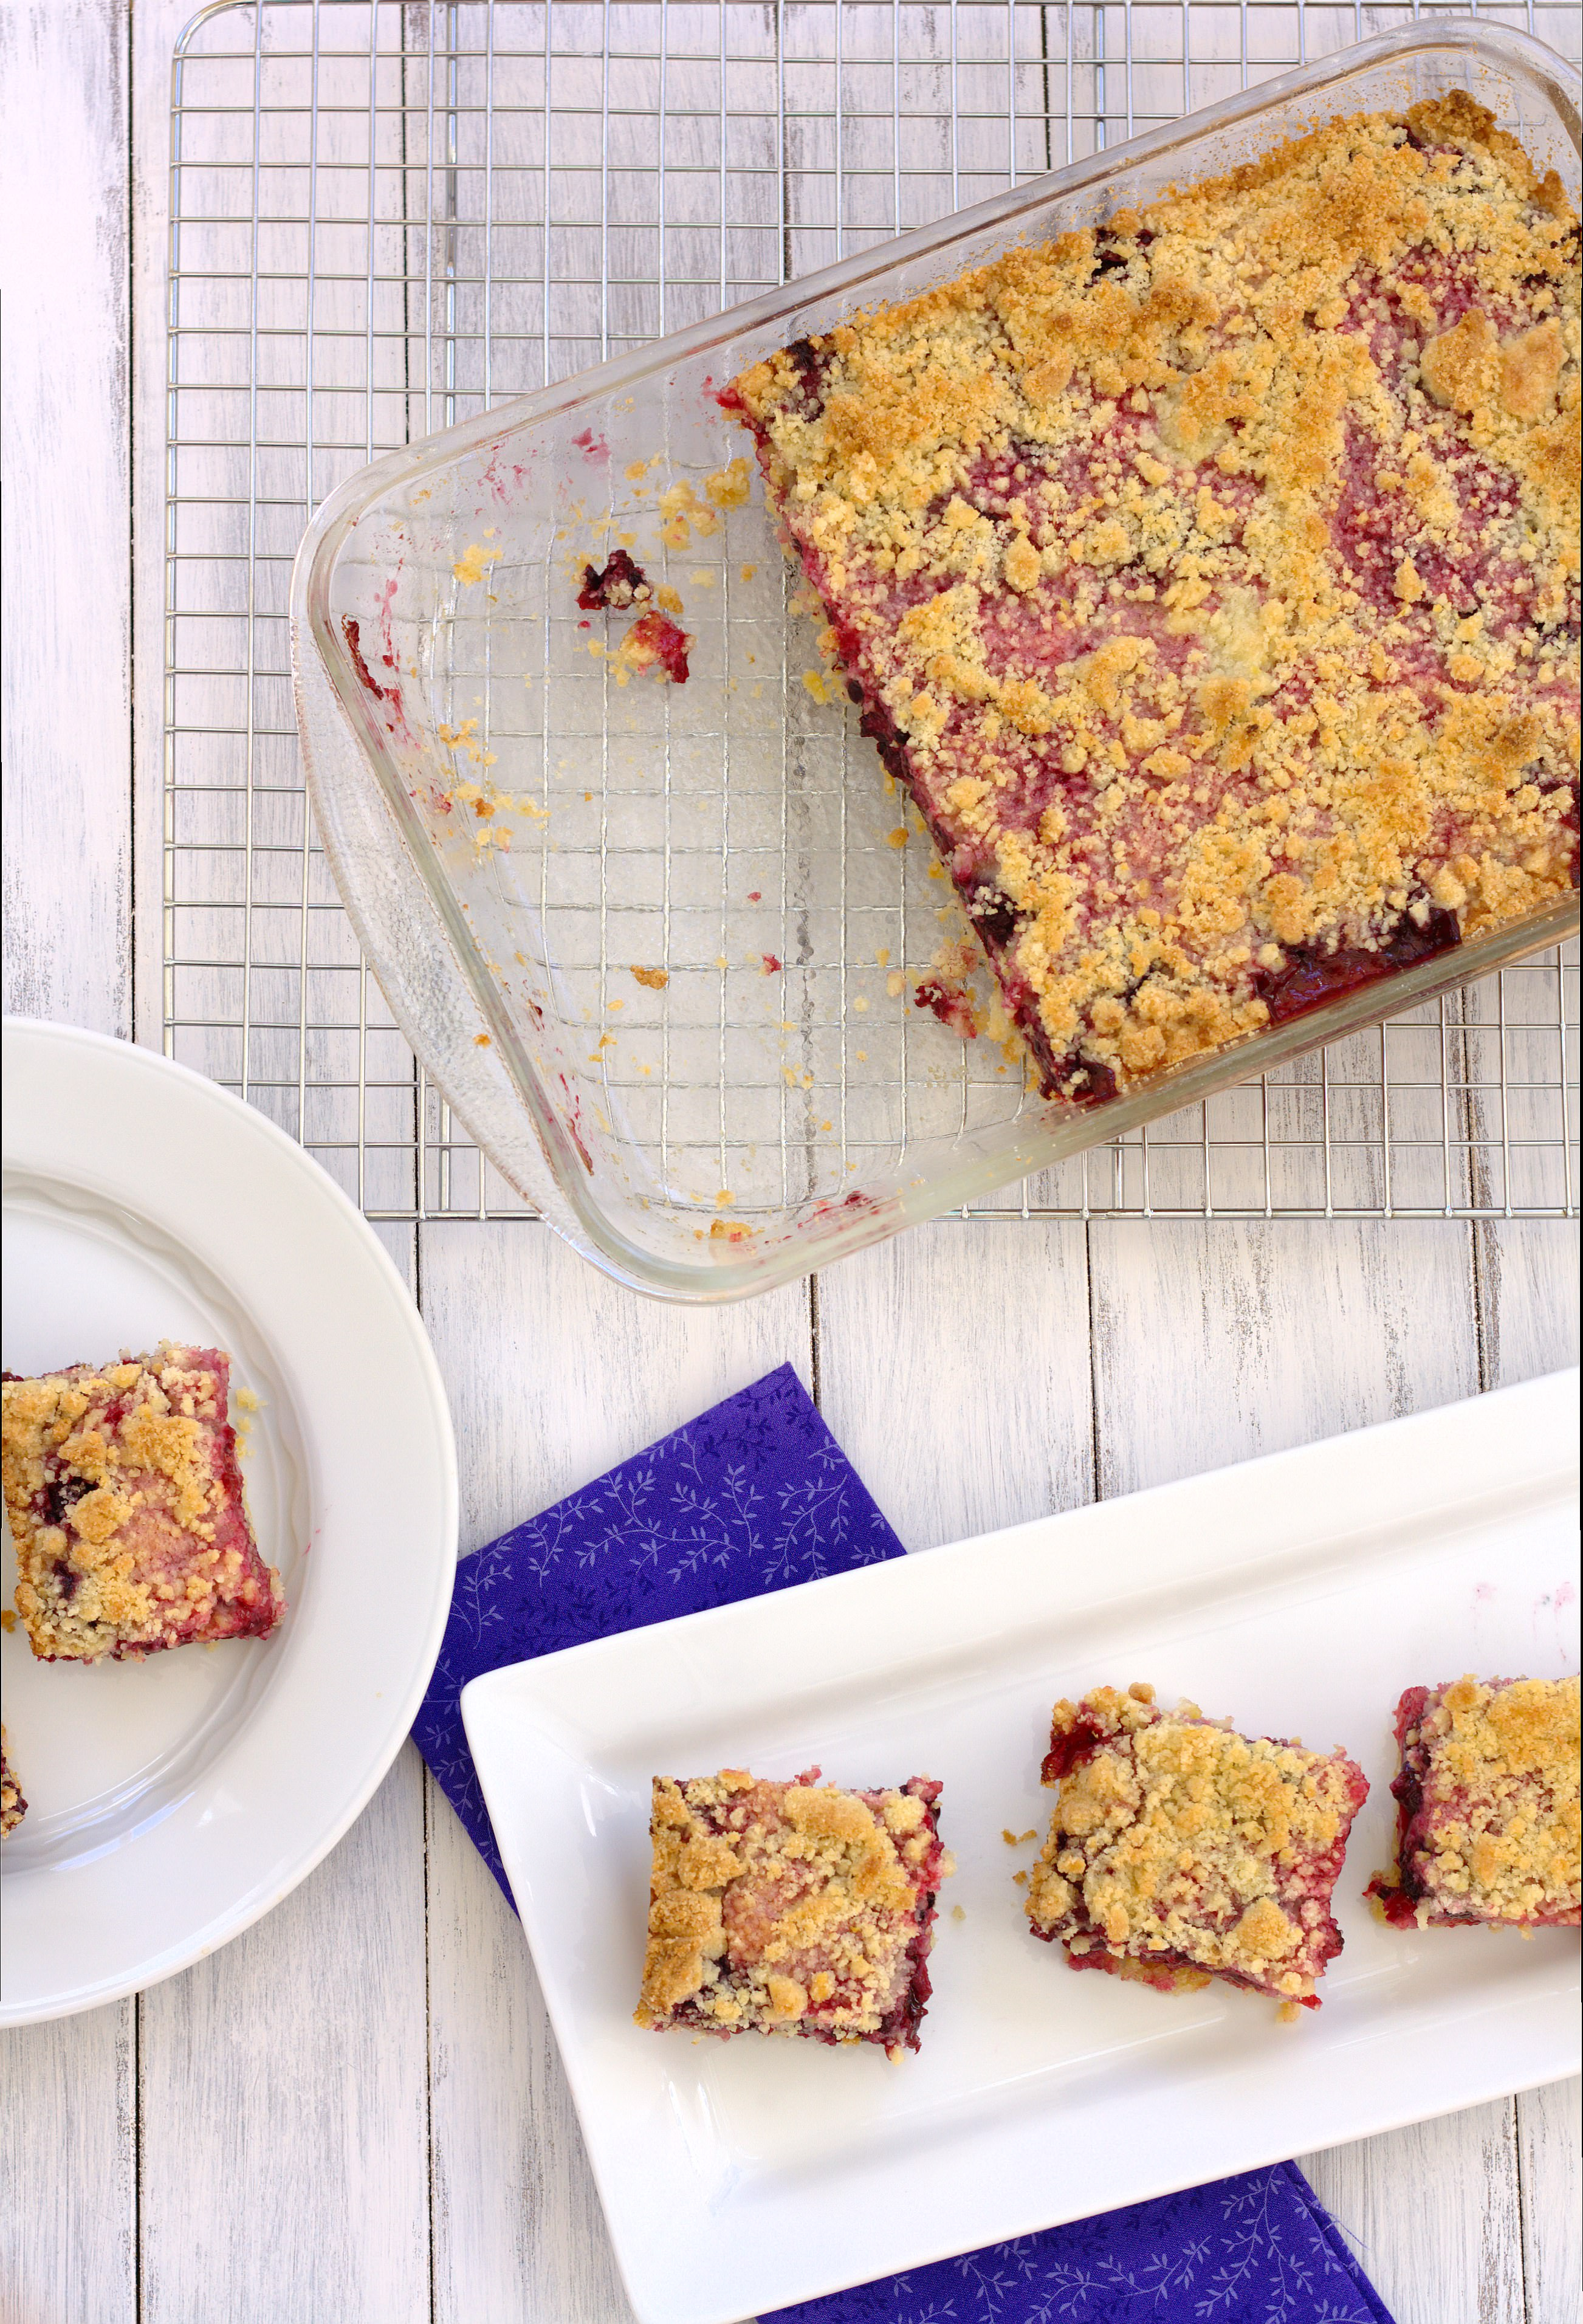 Blackberry Crumb Bars | Kristine's Kitchen